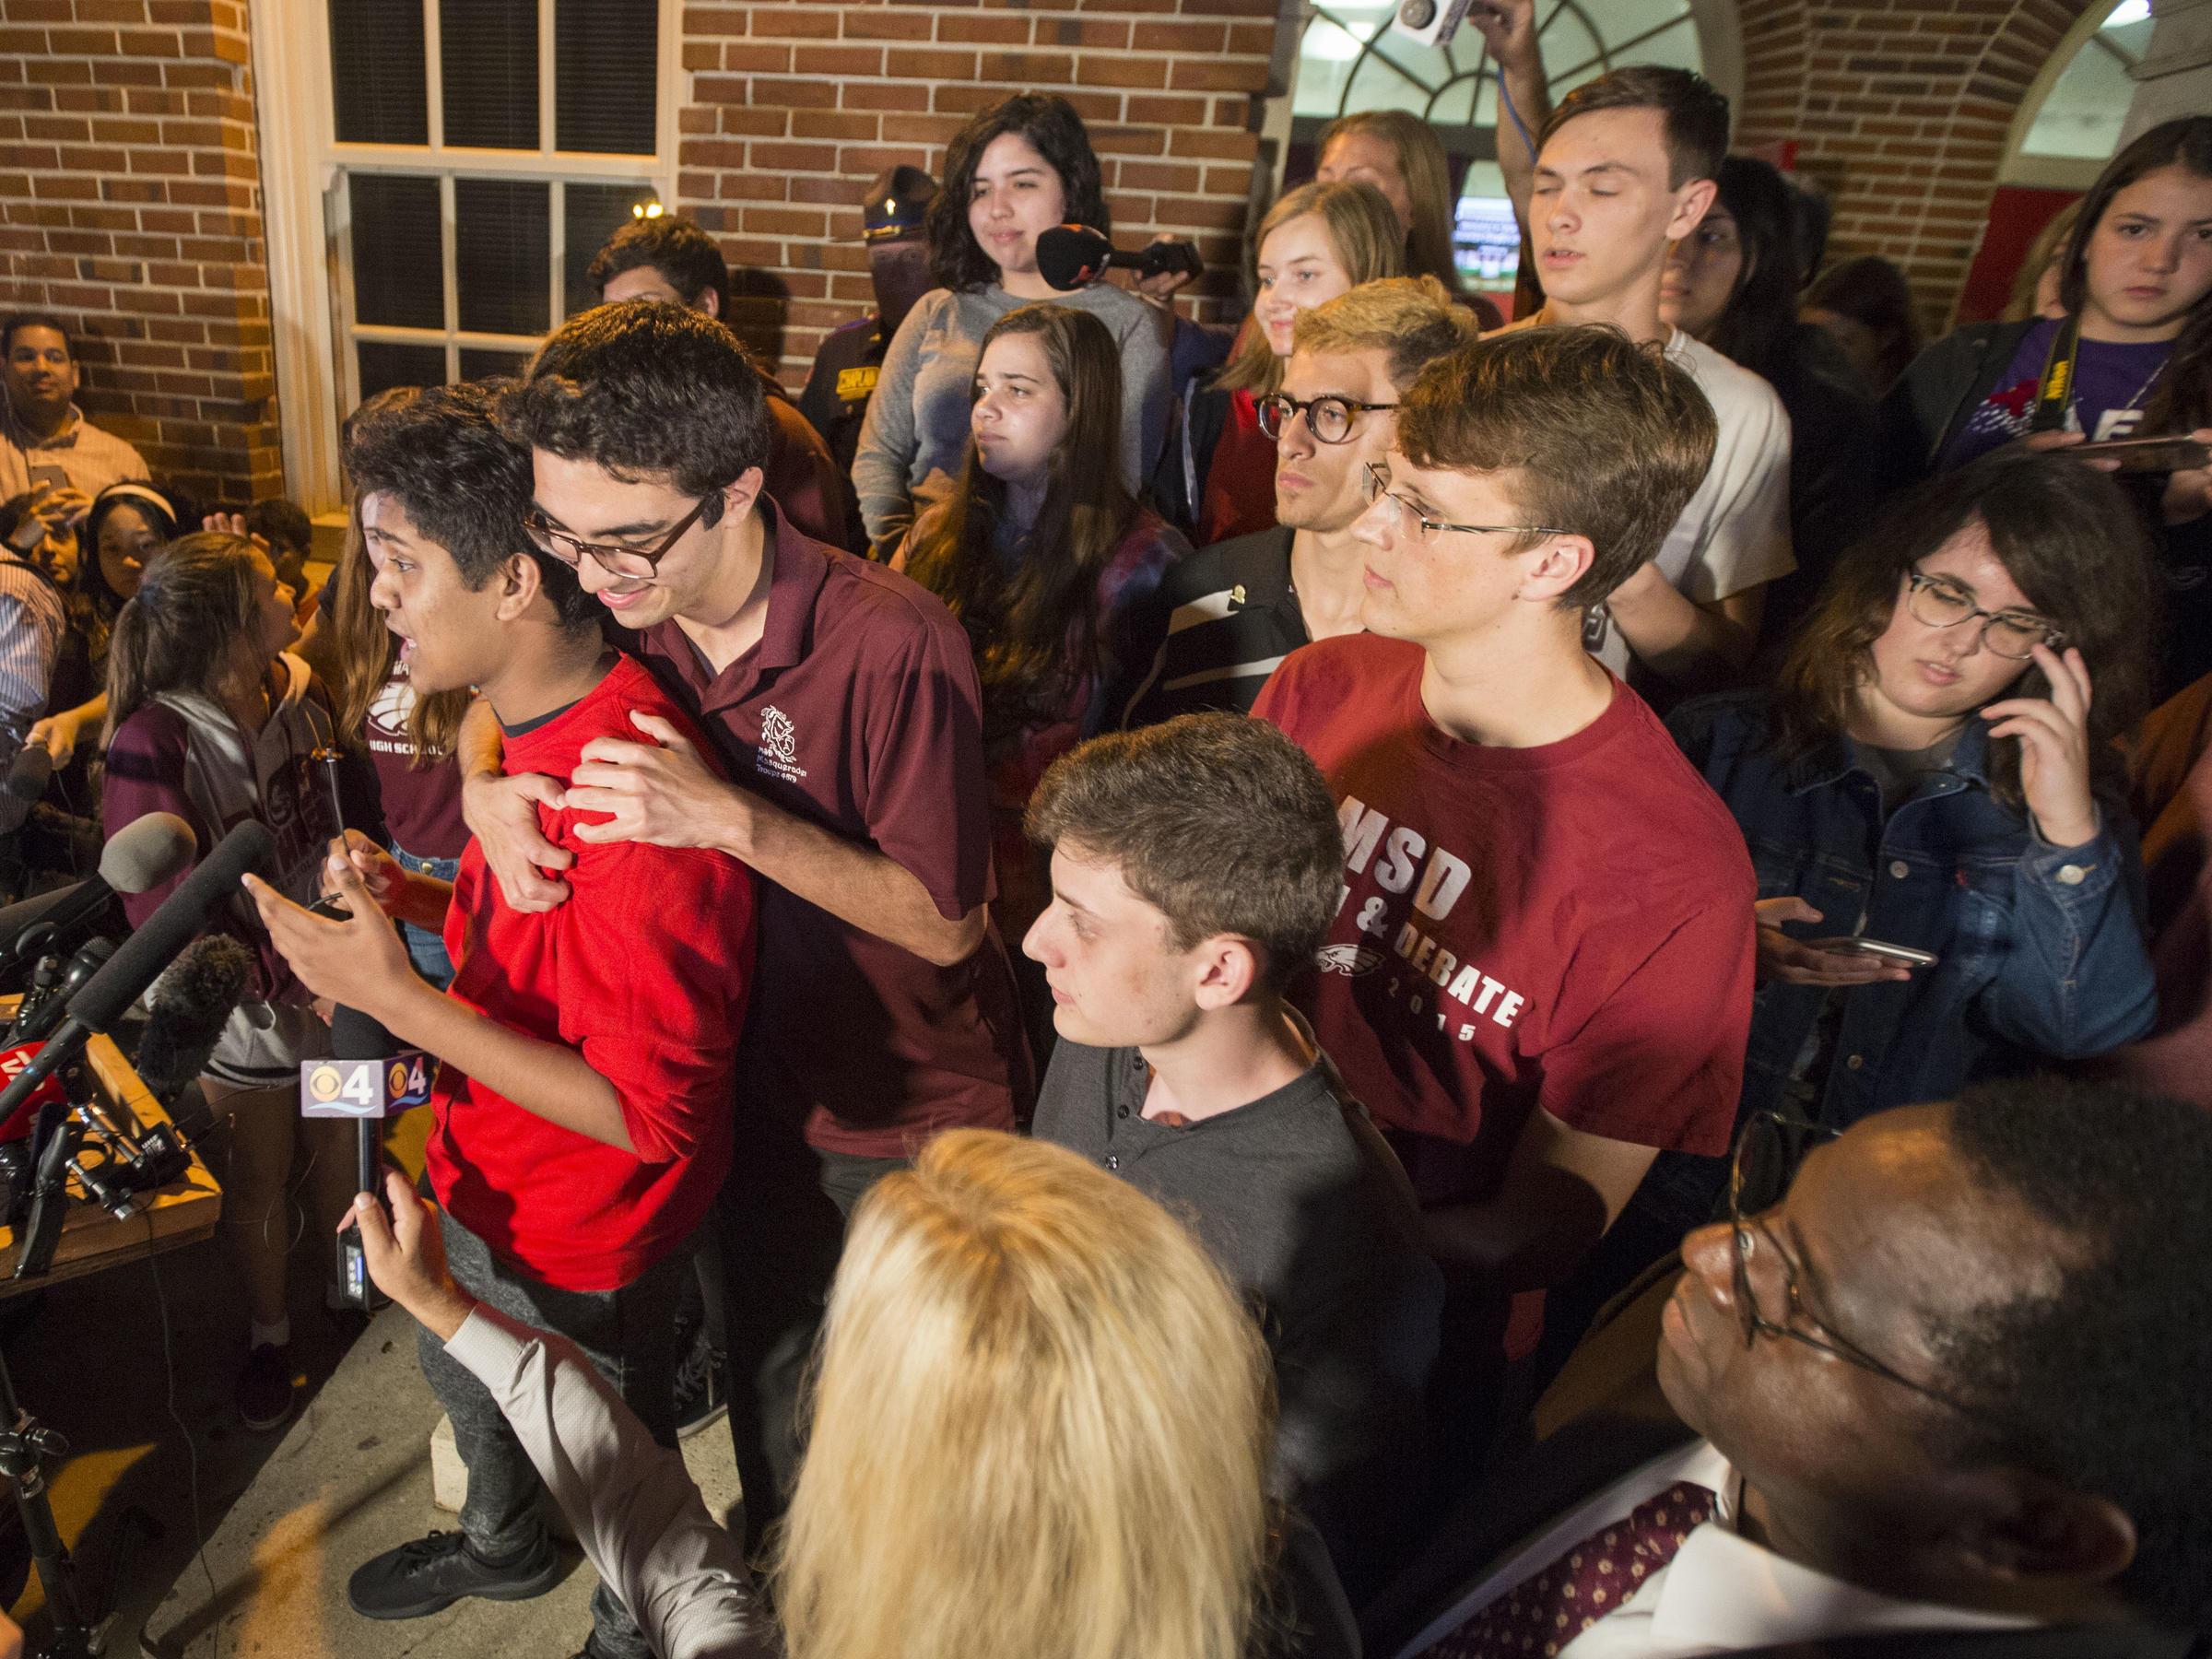 Florida school shooting prompts gun-control rallies